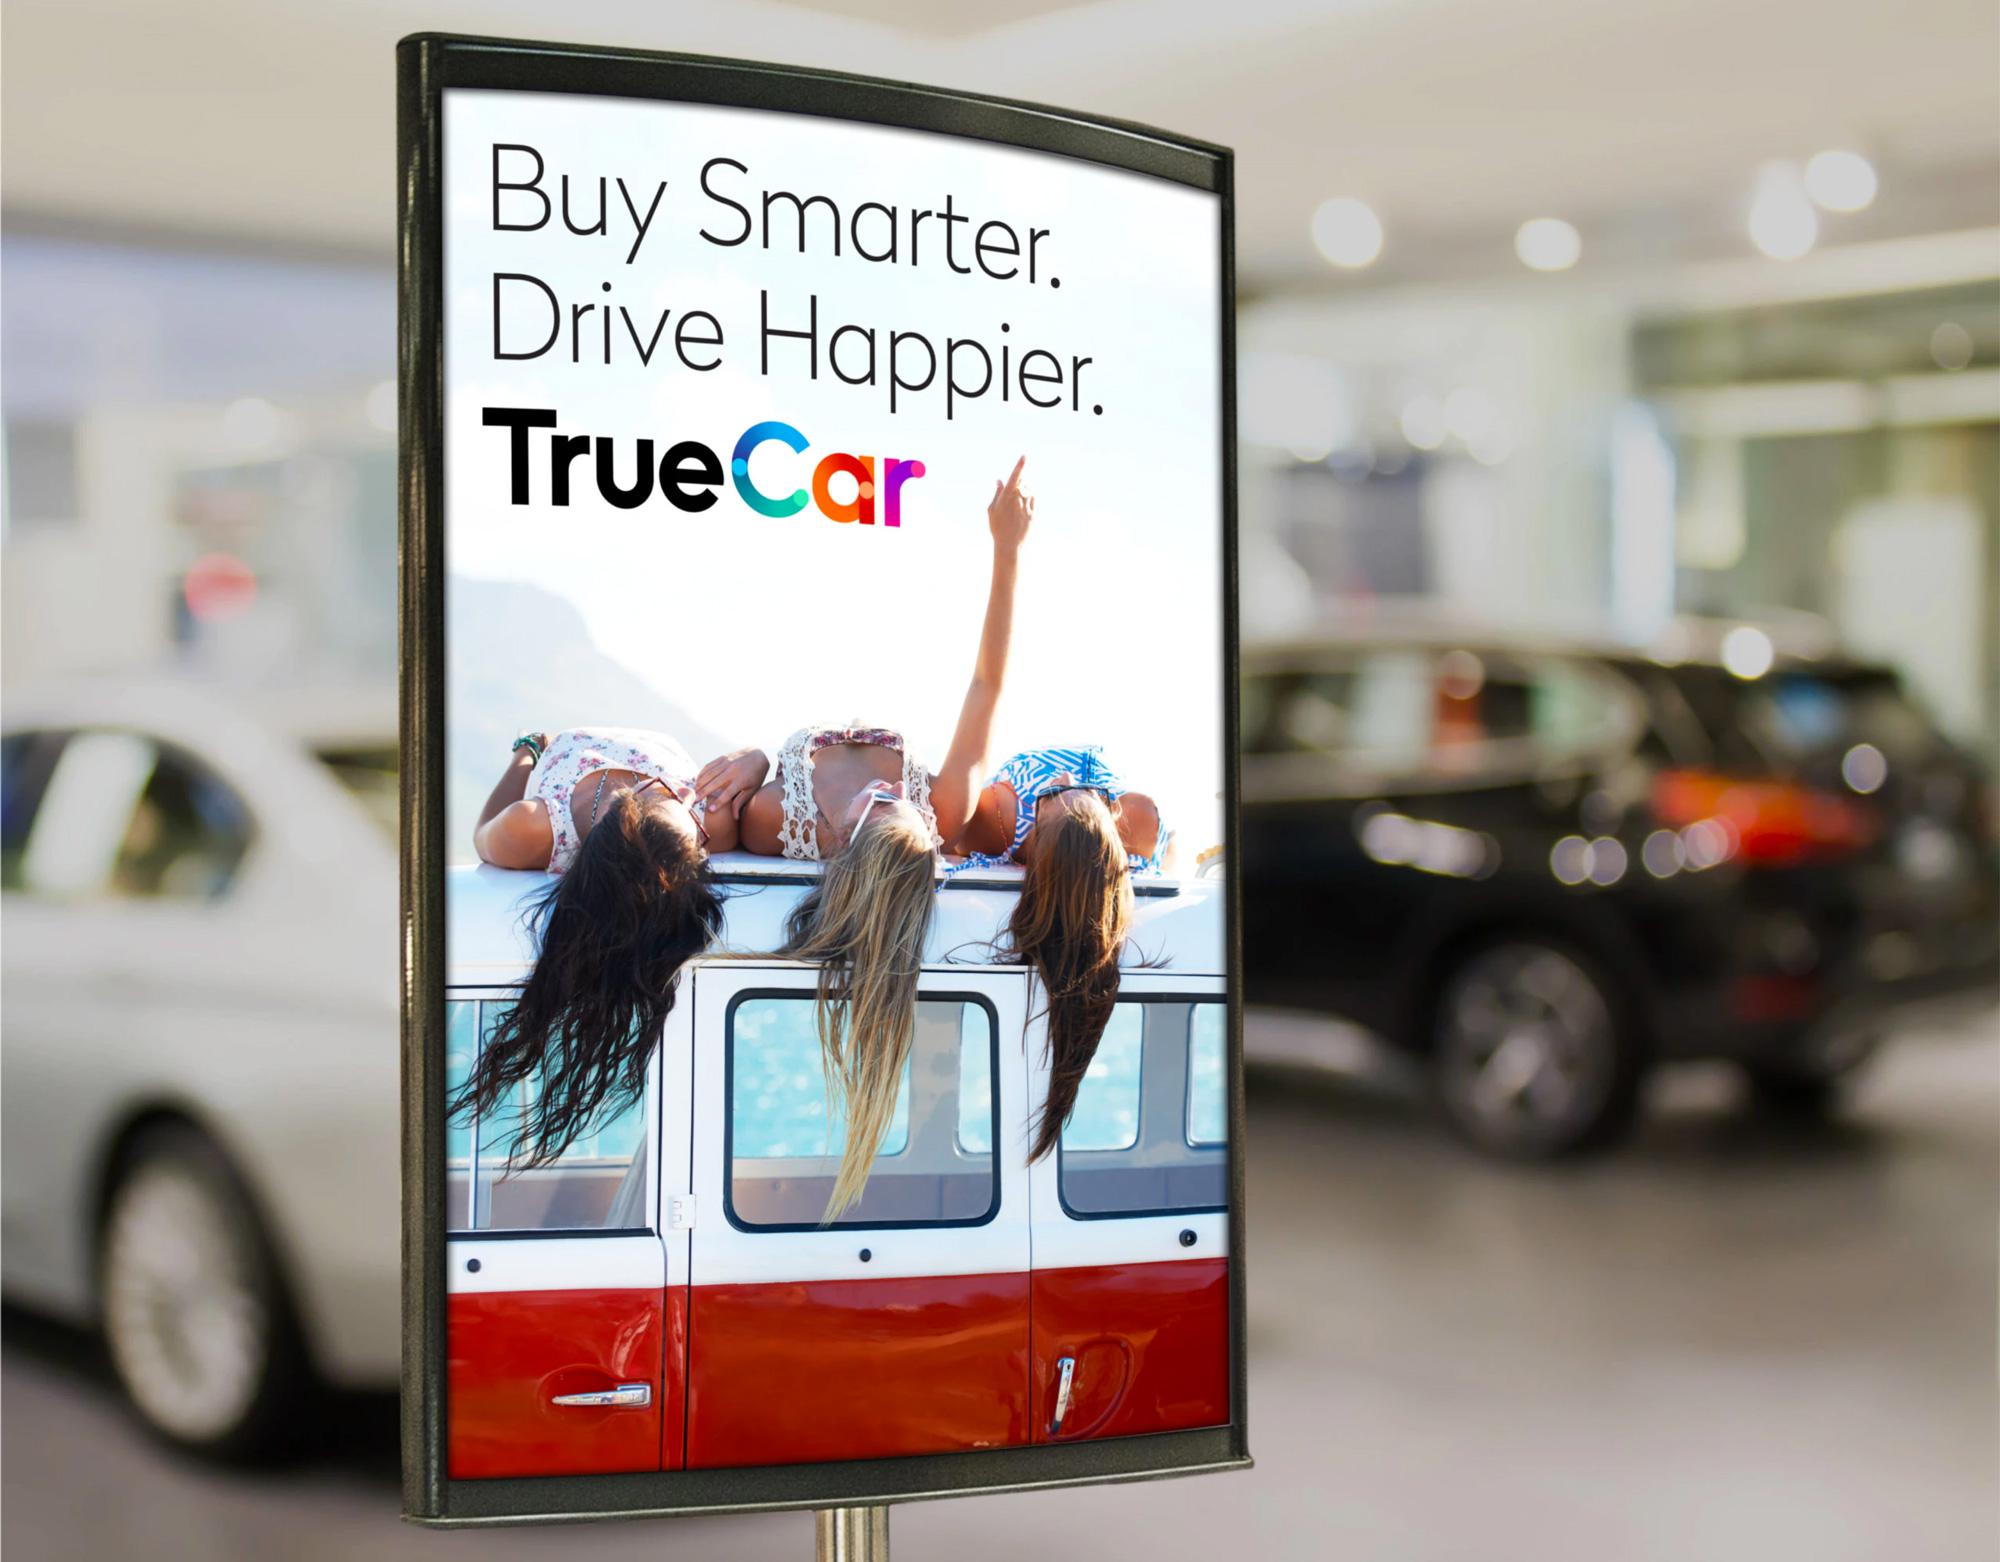 New Logo and Identity for TrueCar by Pentagram